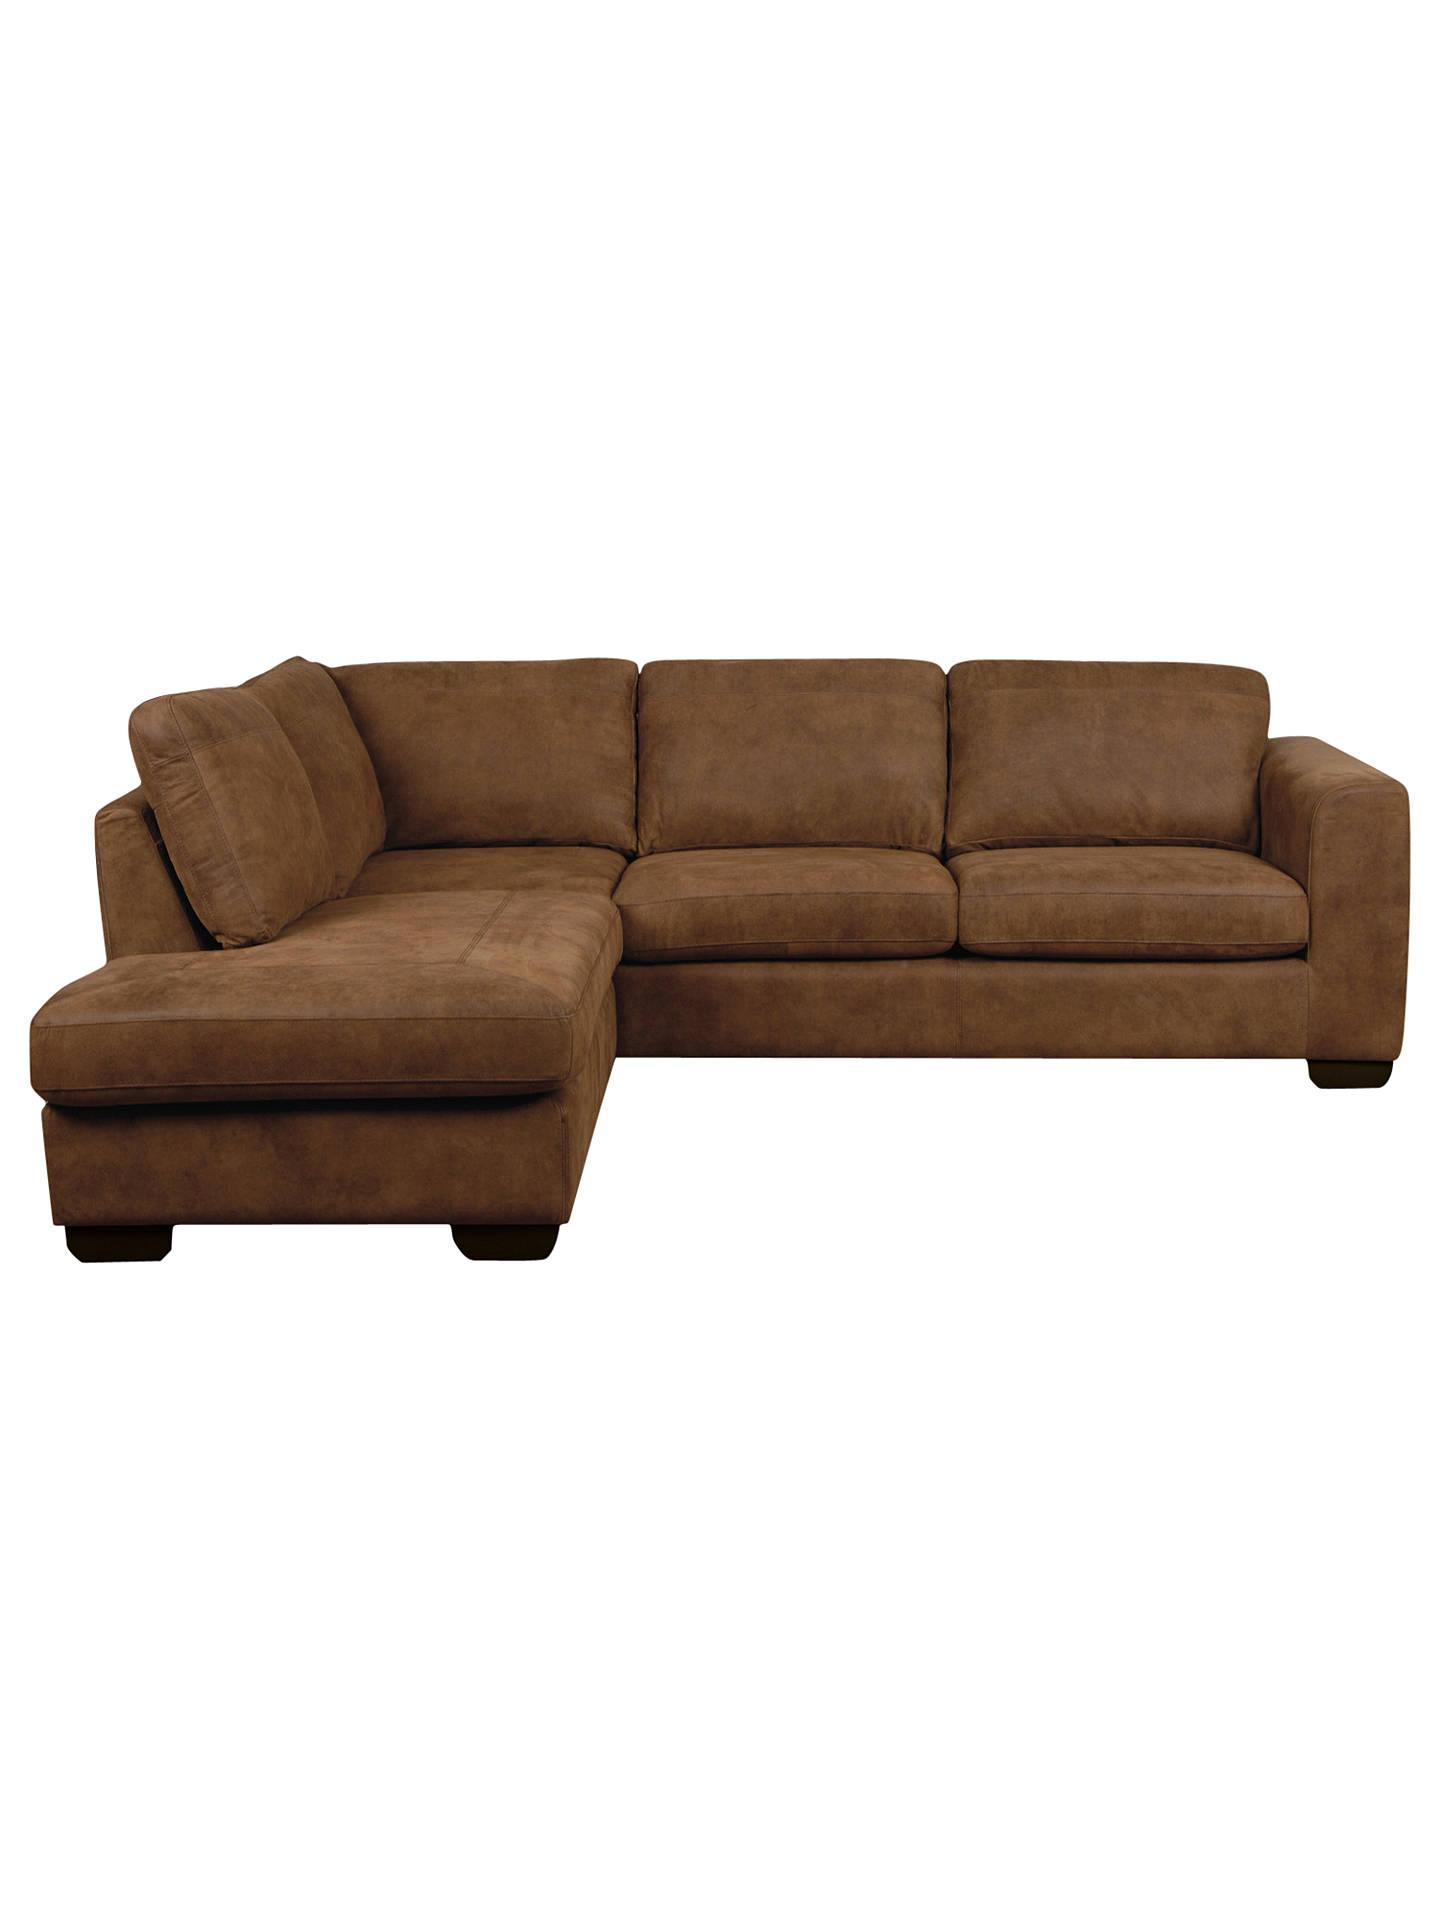 Chaise Longue At John Lewis on chaise furniture, chaise sofa sleeper, chaise recliner chair,